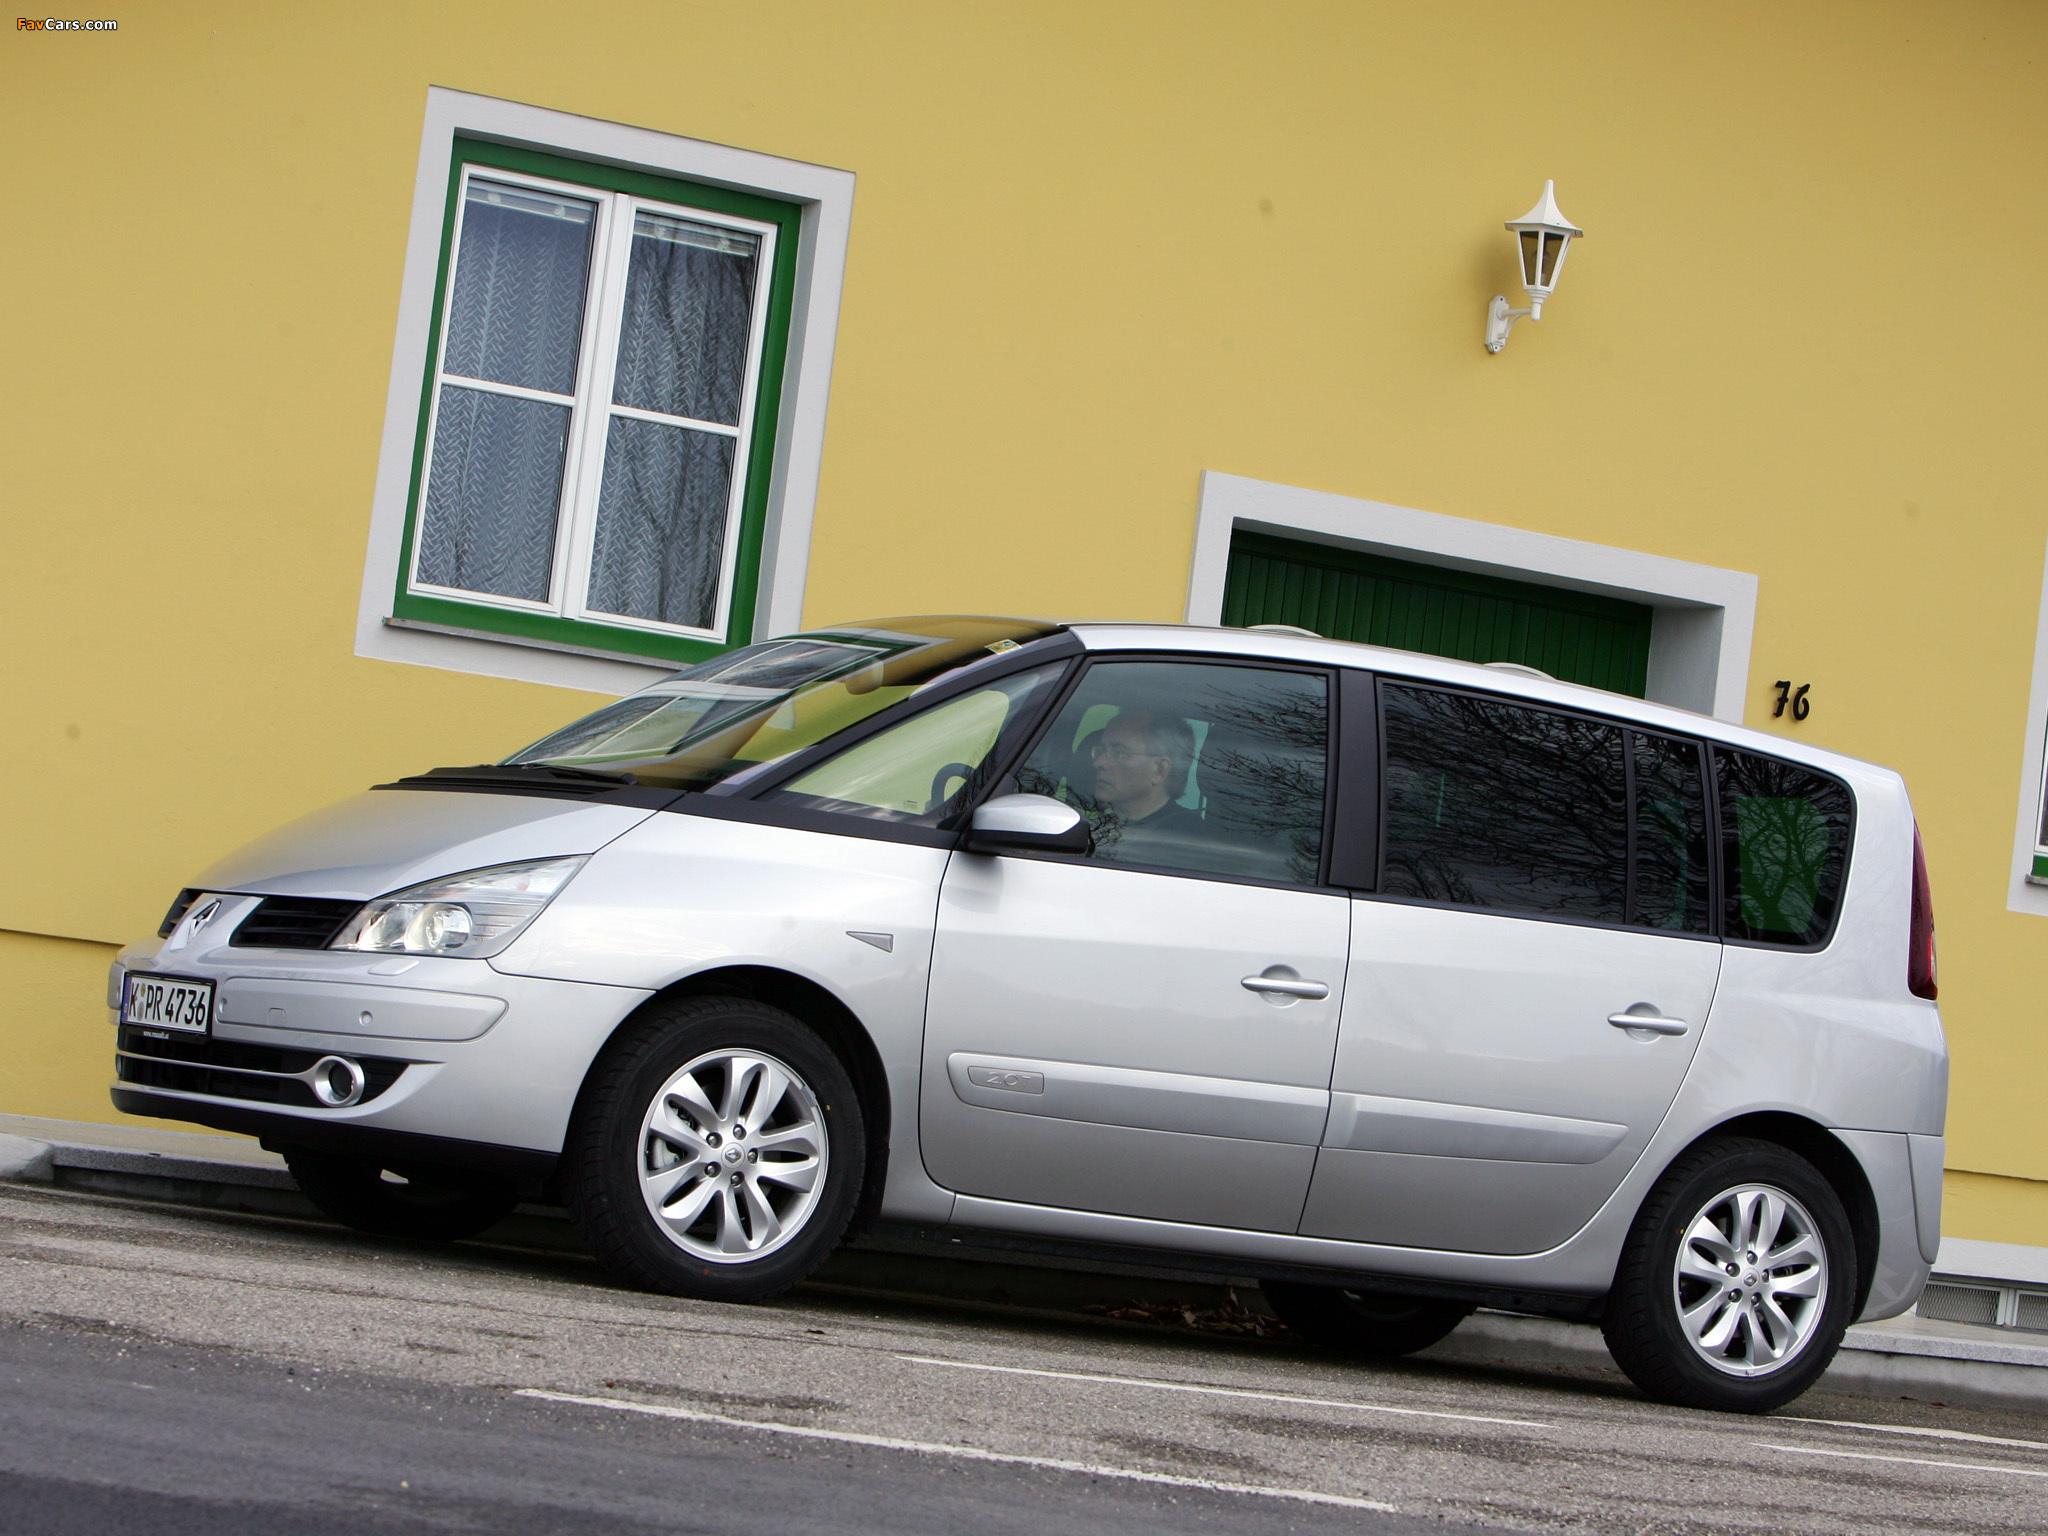 Renault Espace (J81) 2006 photos (2048 x 1536)